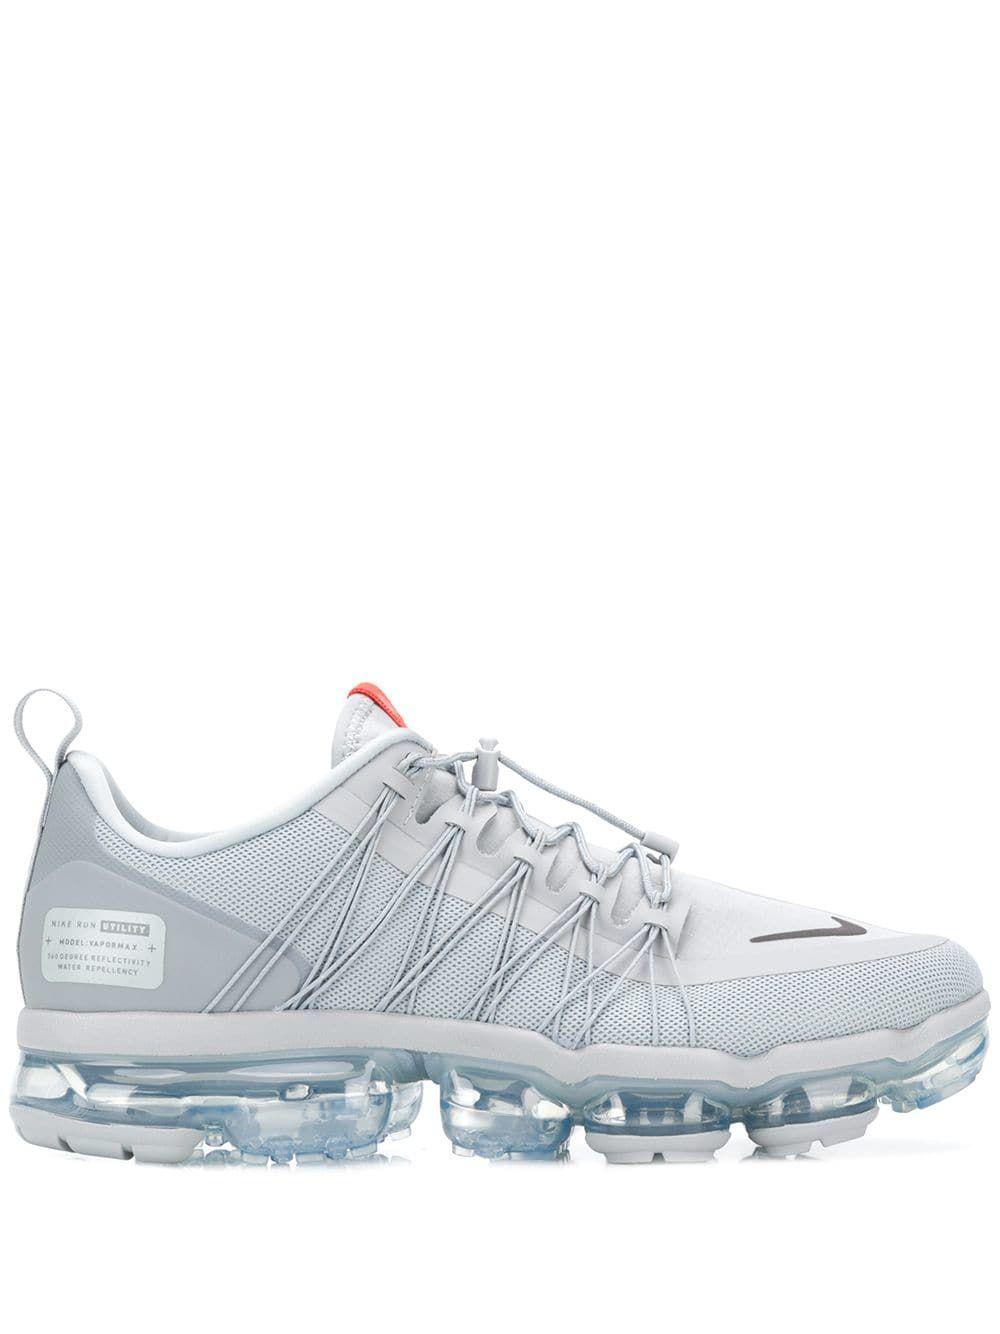 3bebaaac5278 Nike Air Vapormax Run Utility Sneakers - Farfetch